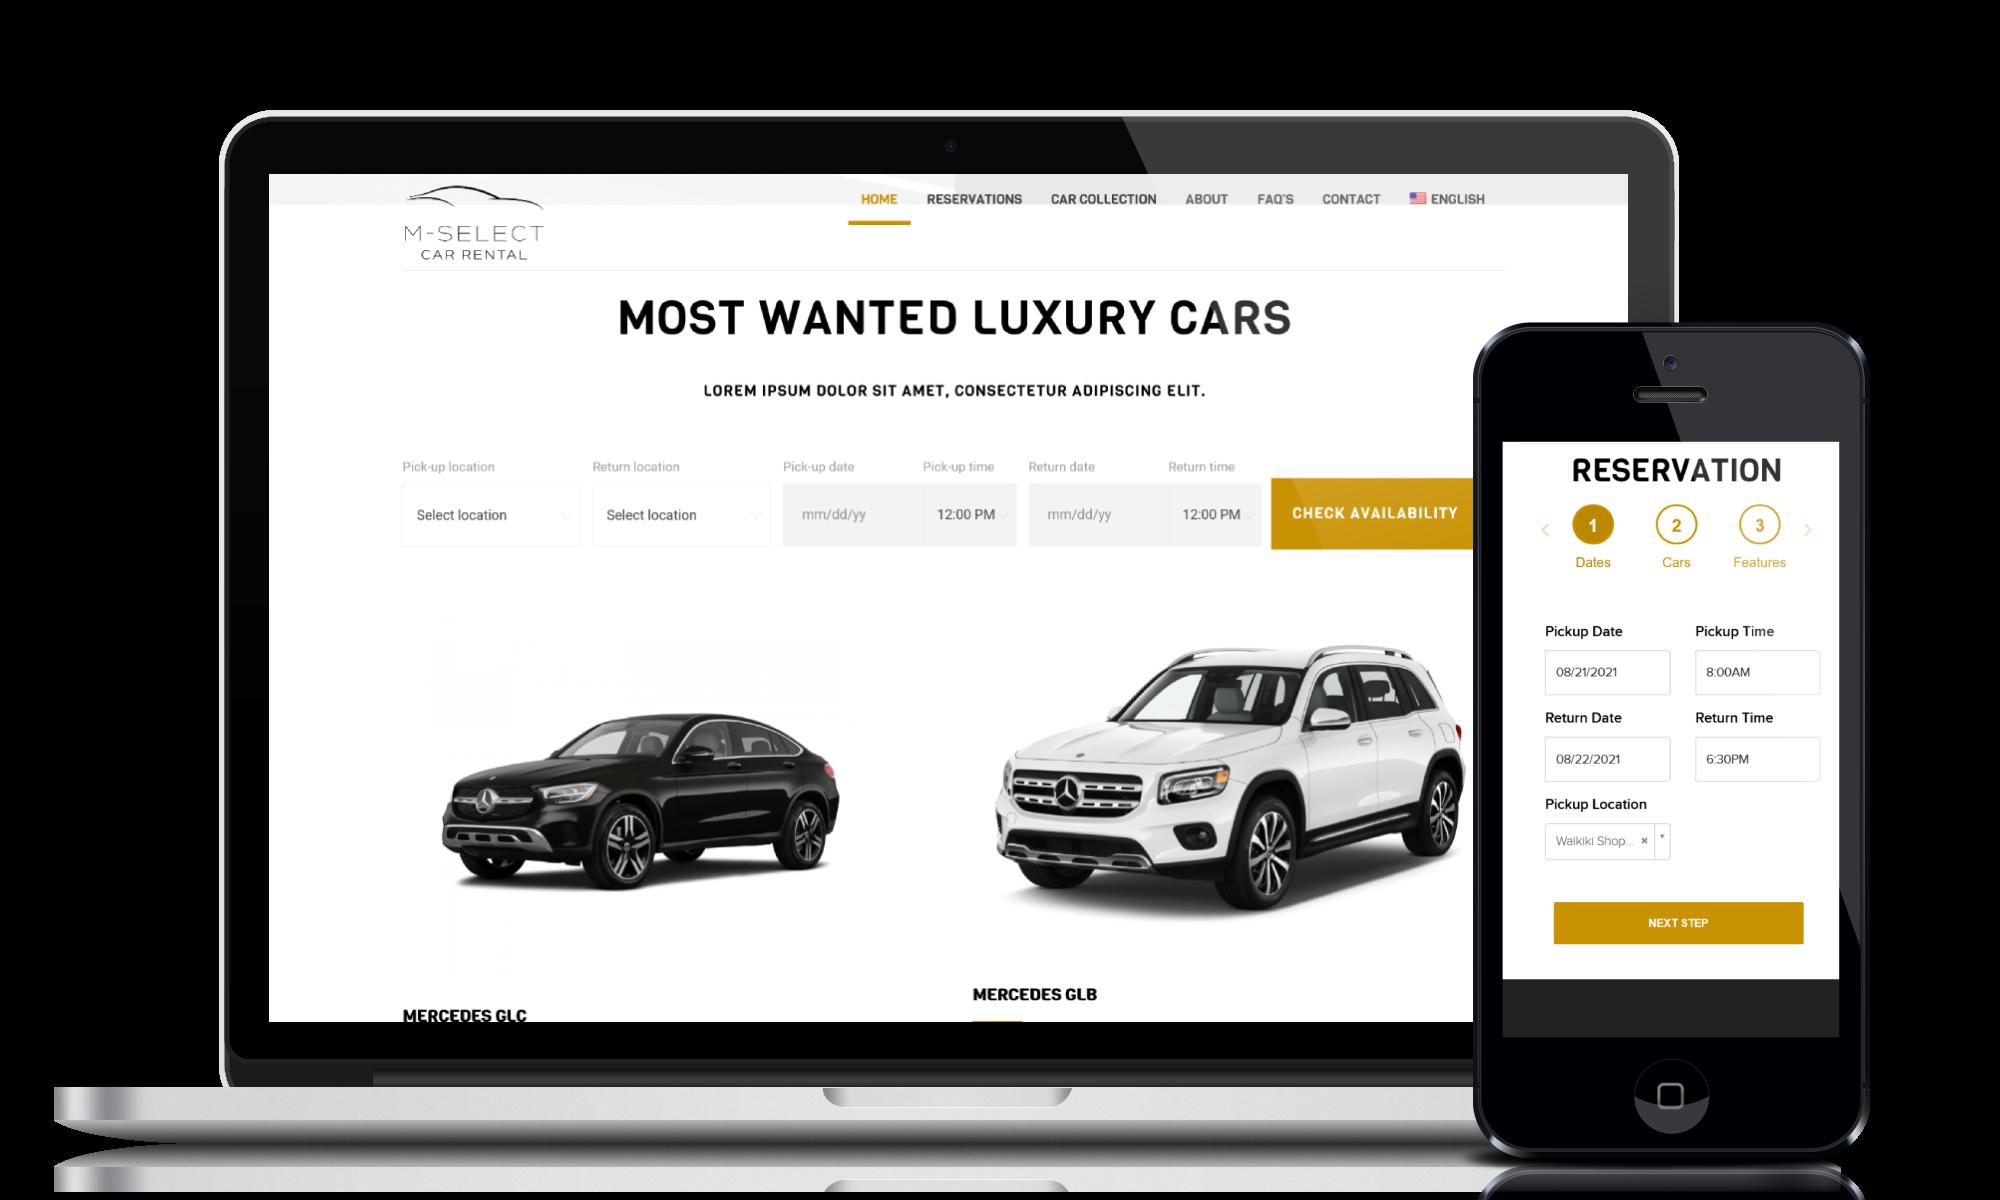 Car rental website design and development service for customer M-Select Rent A Car